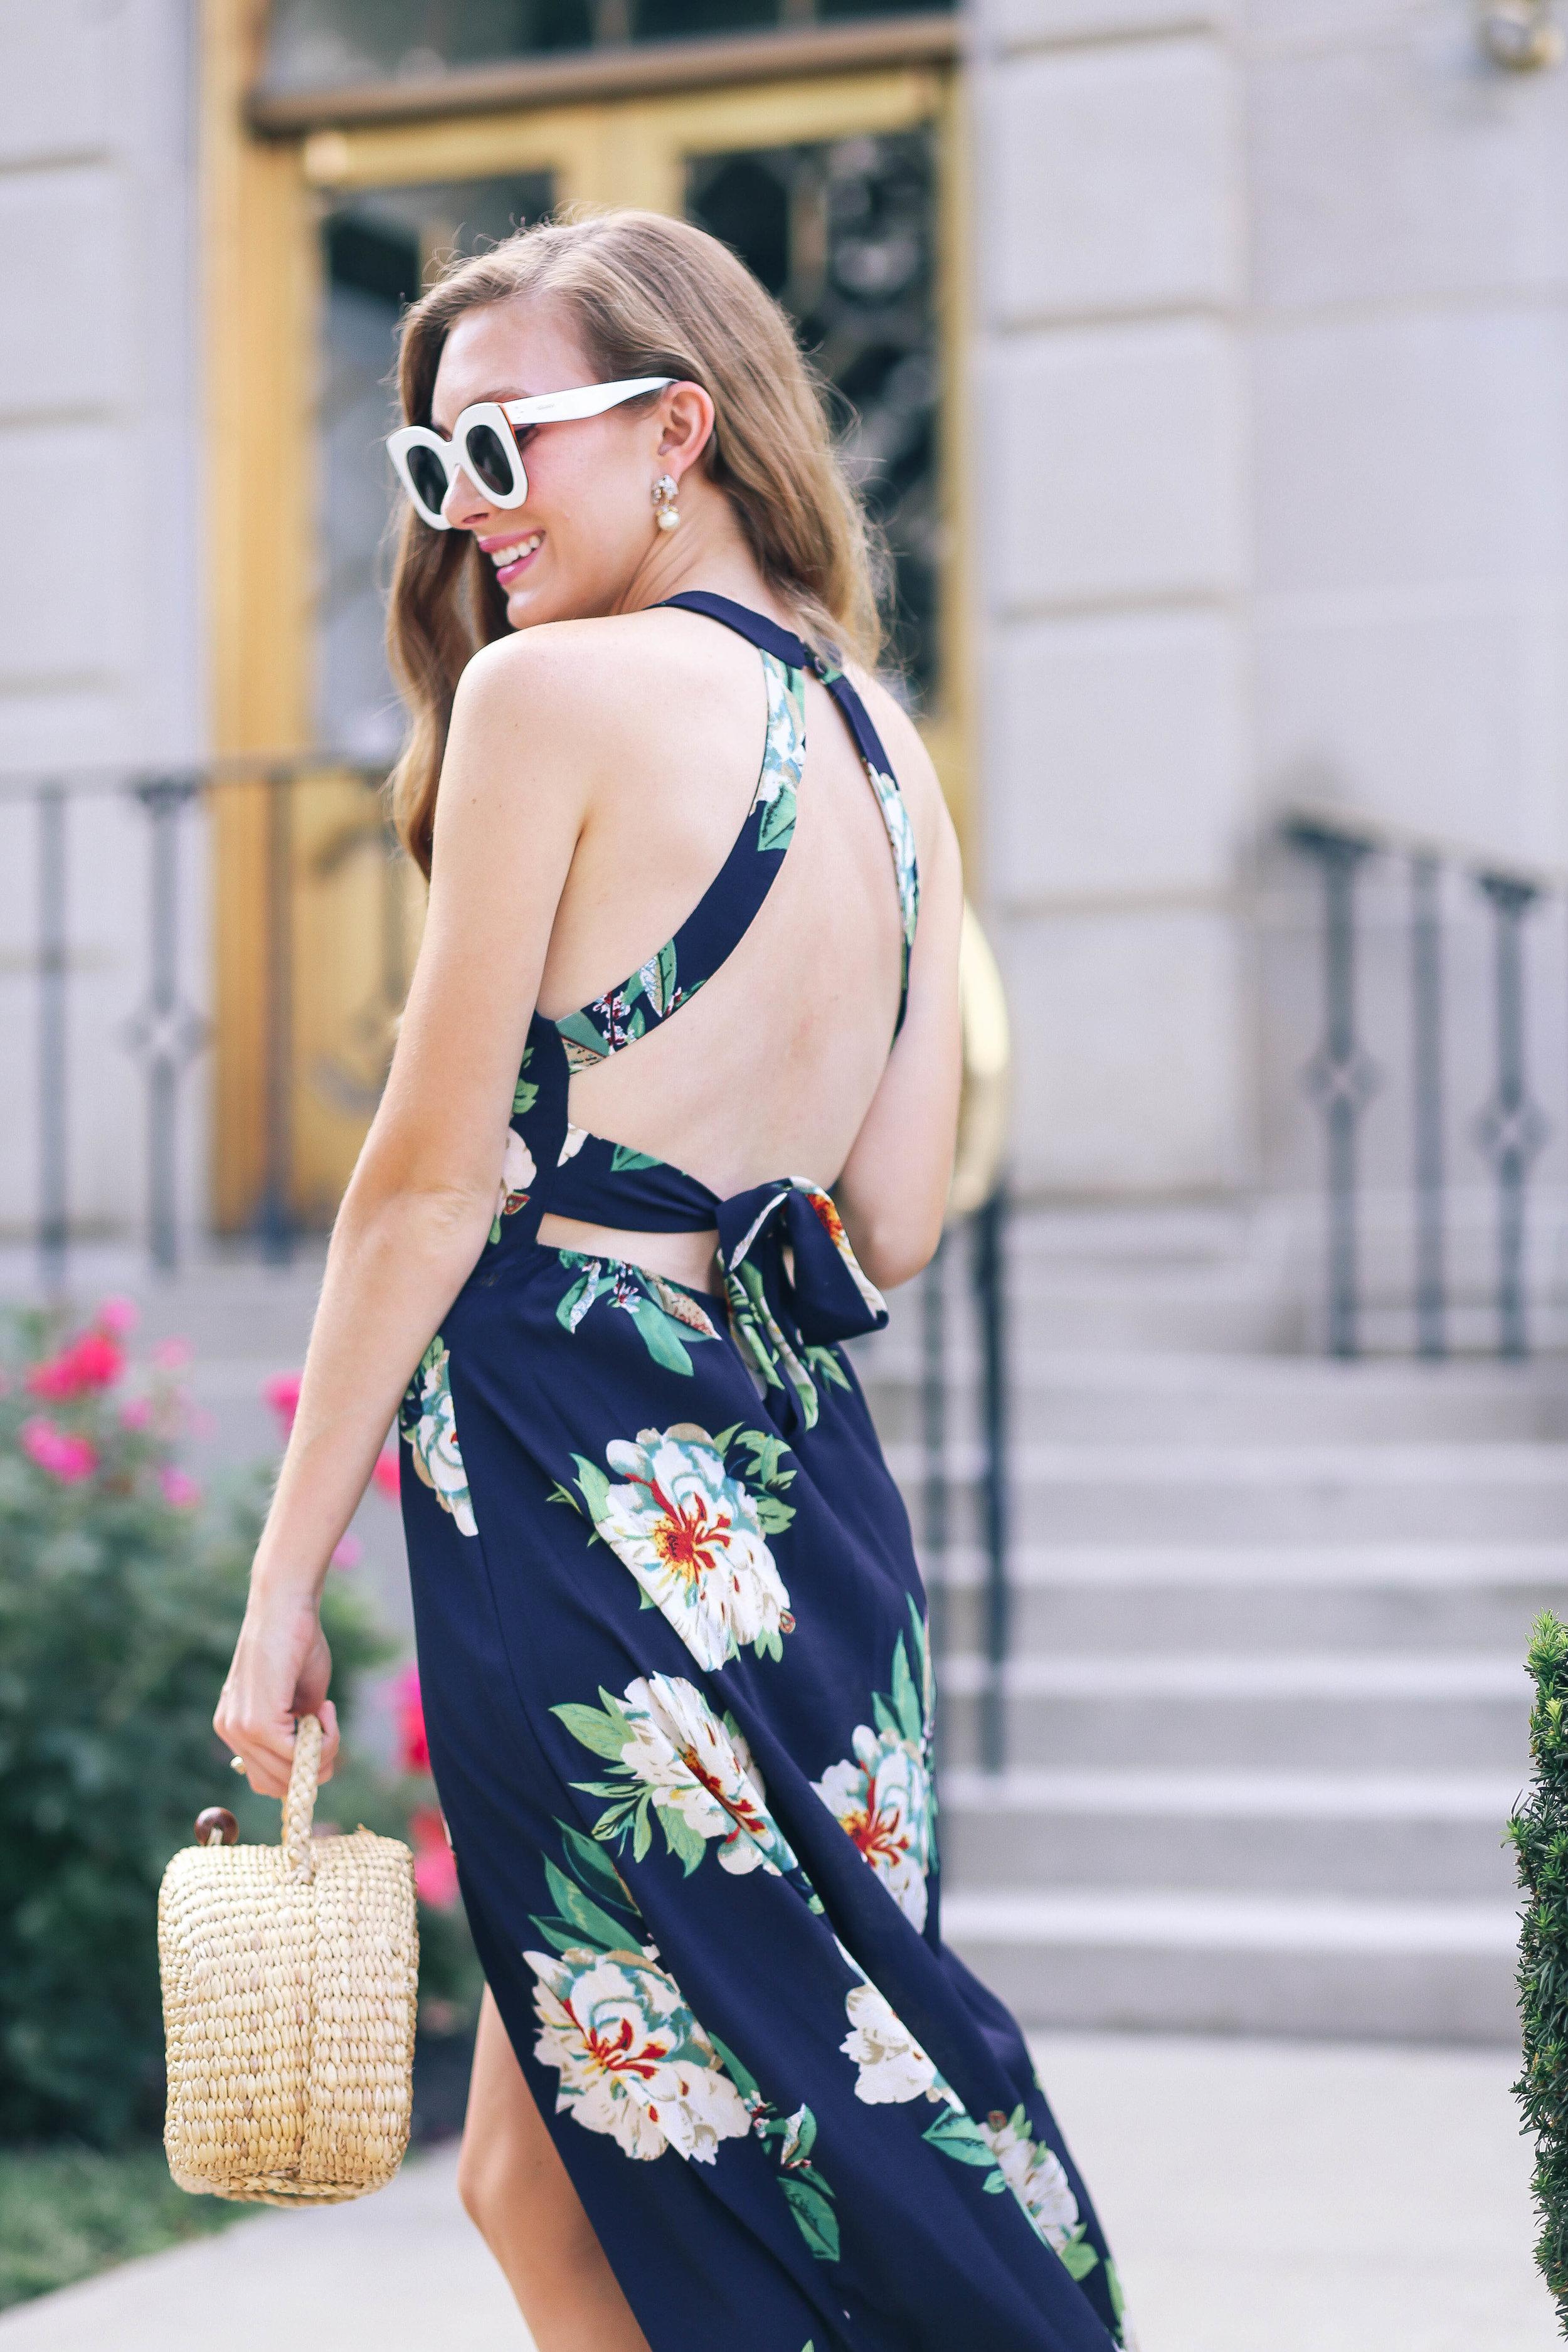 The Floral Maxi Dress- Enchanting Elegance